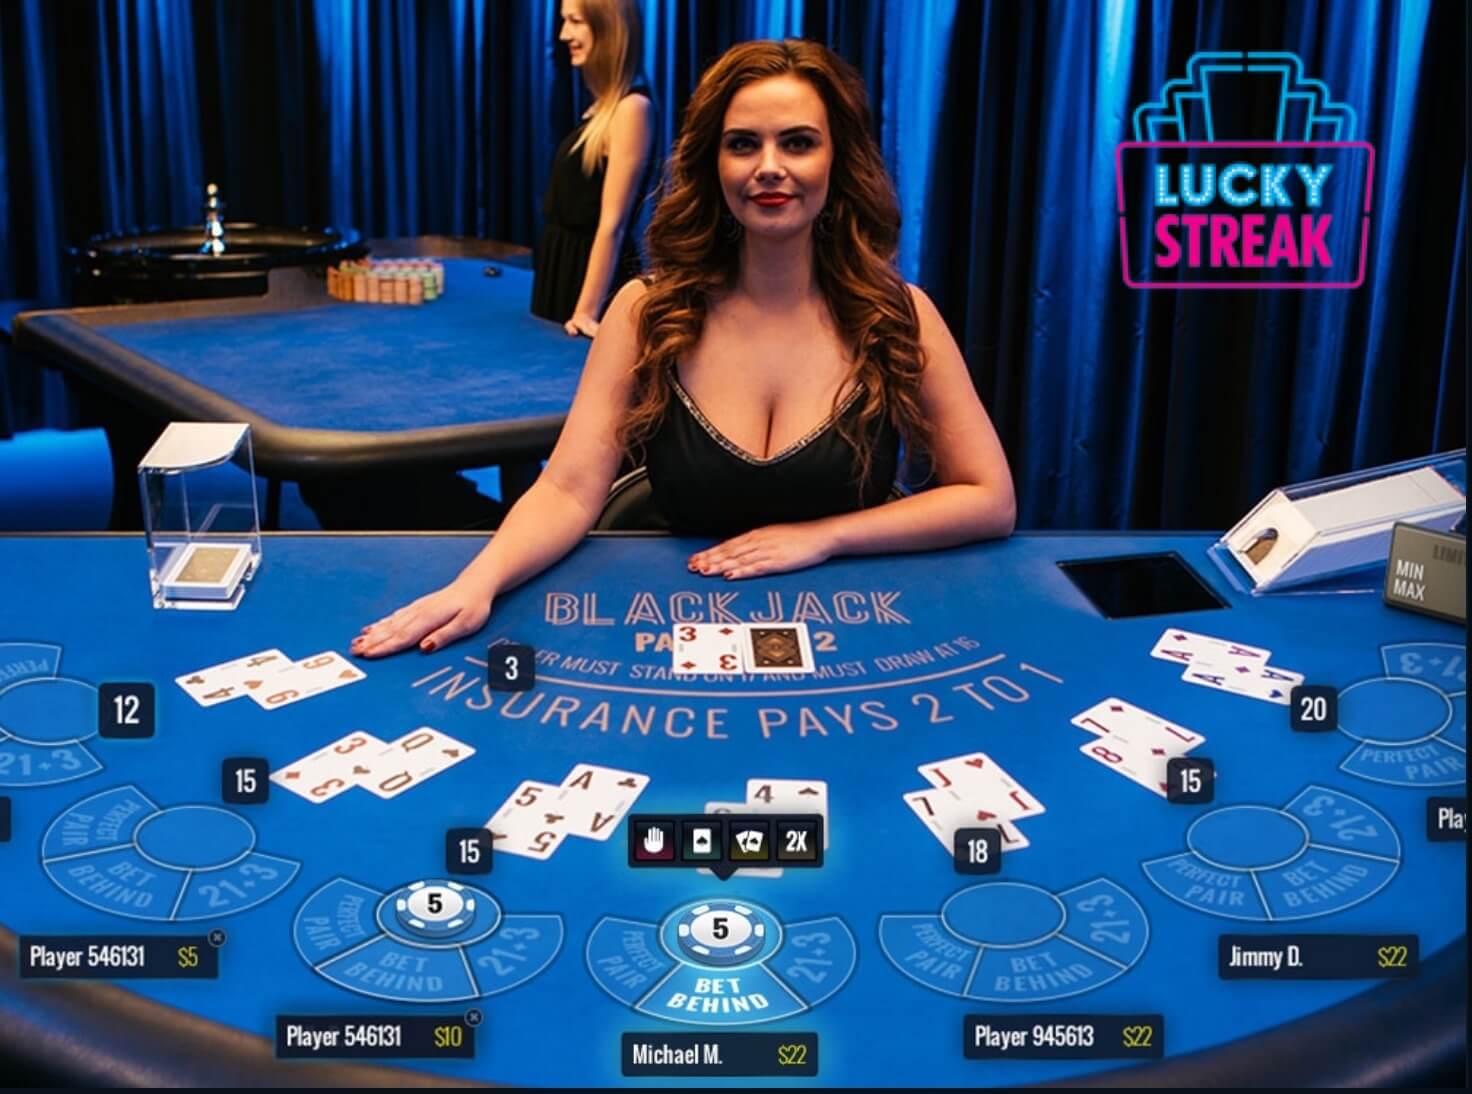 lucky streak live blackjack